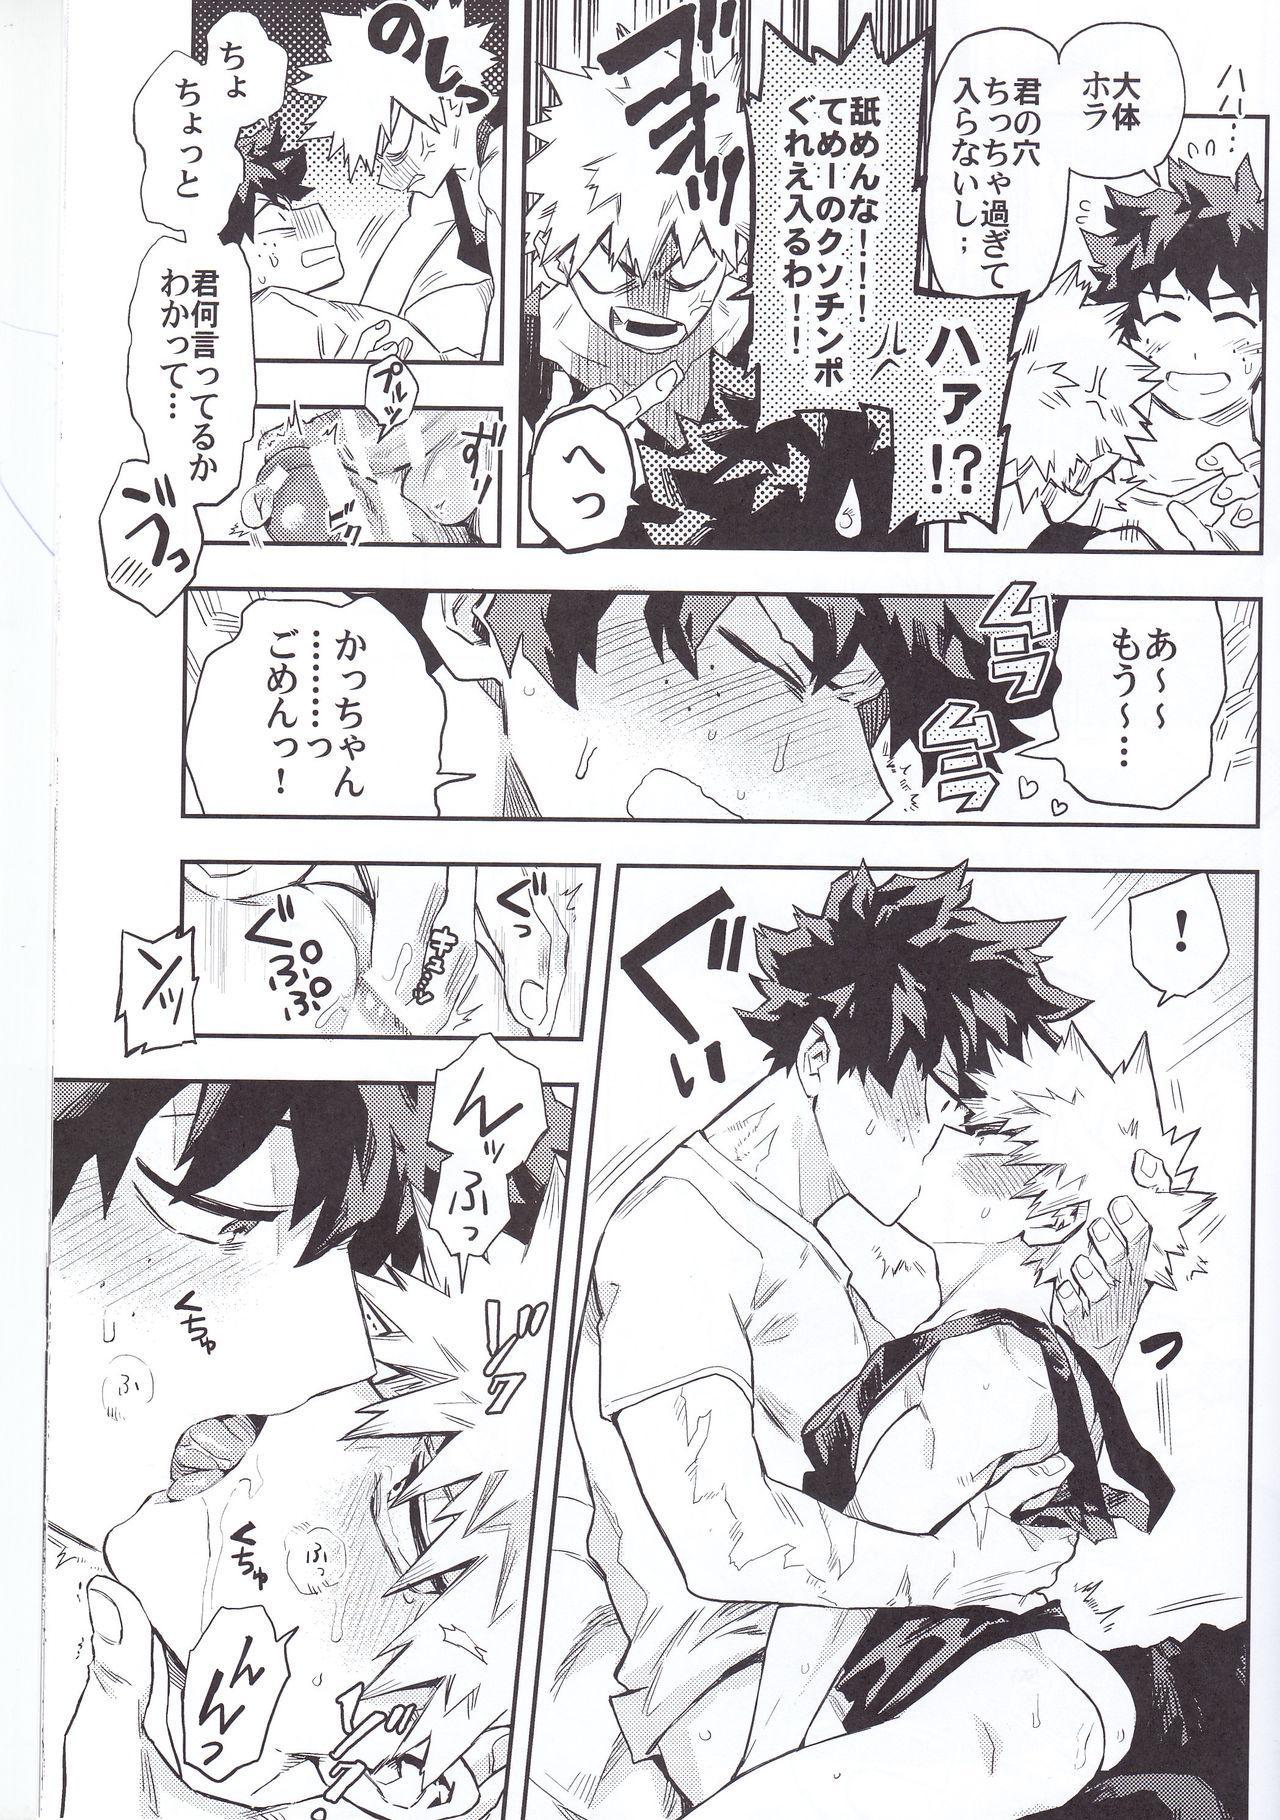 Kuchiguruma ni wa Goyoushin 13